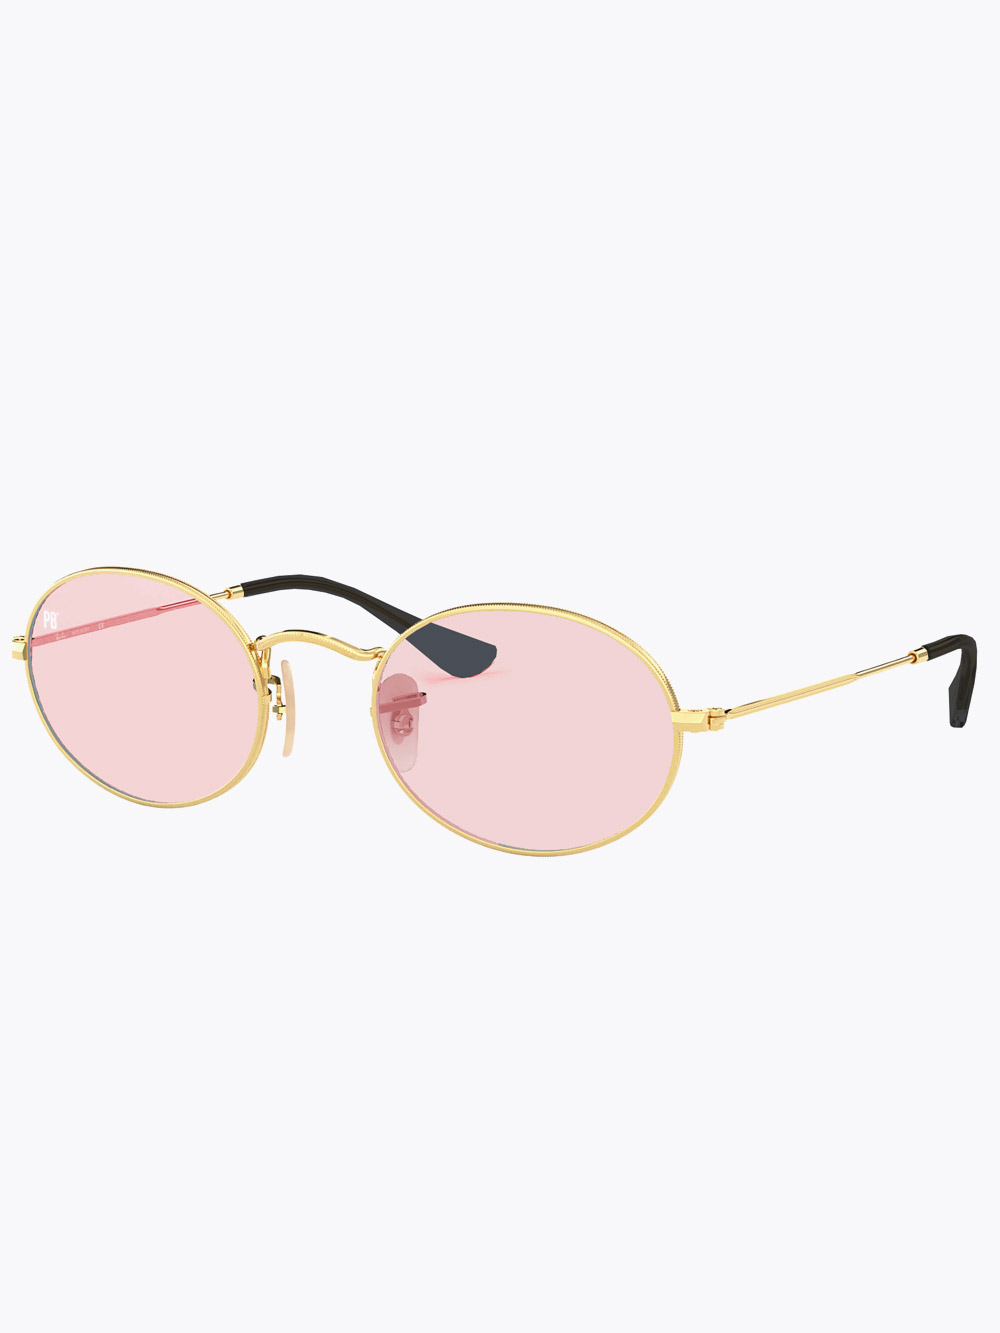 oval-zonnebril-pink